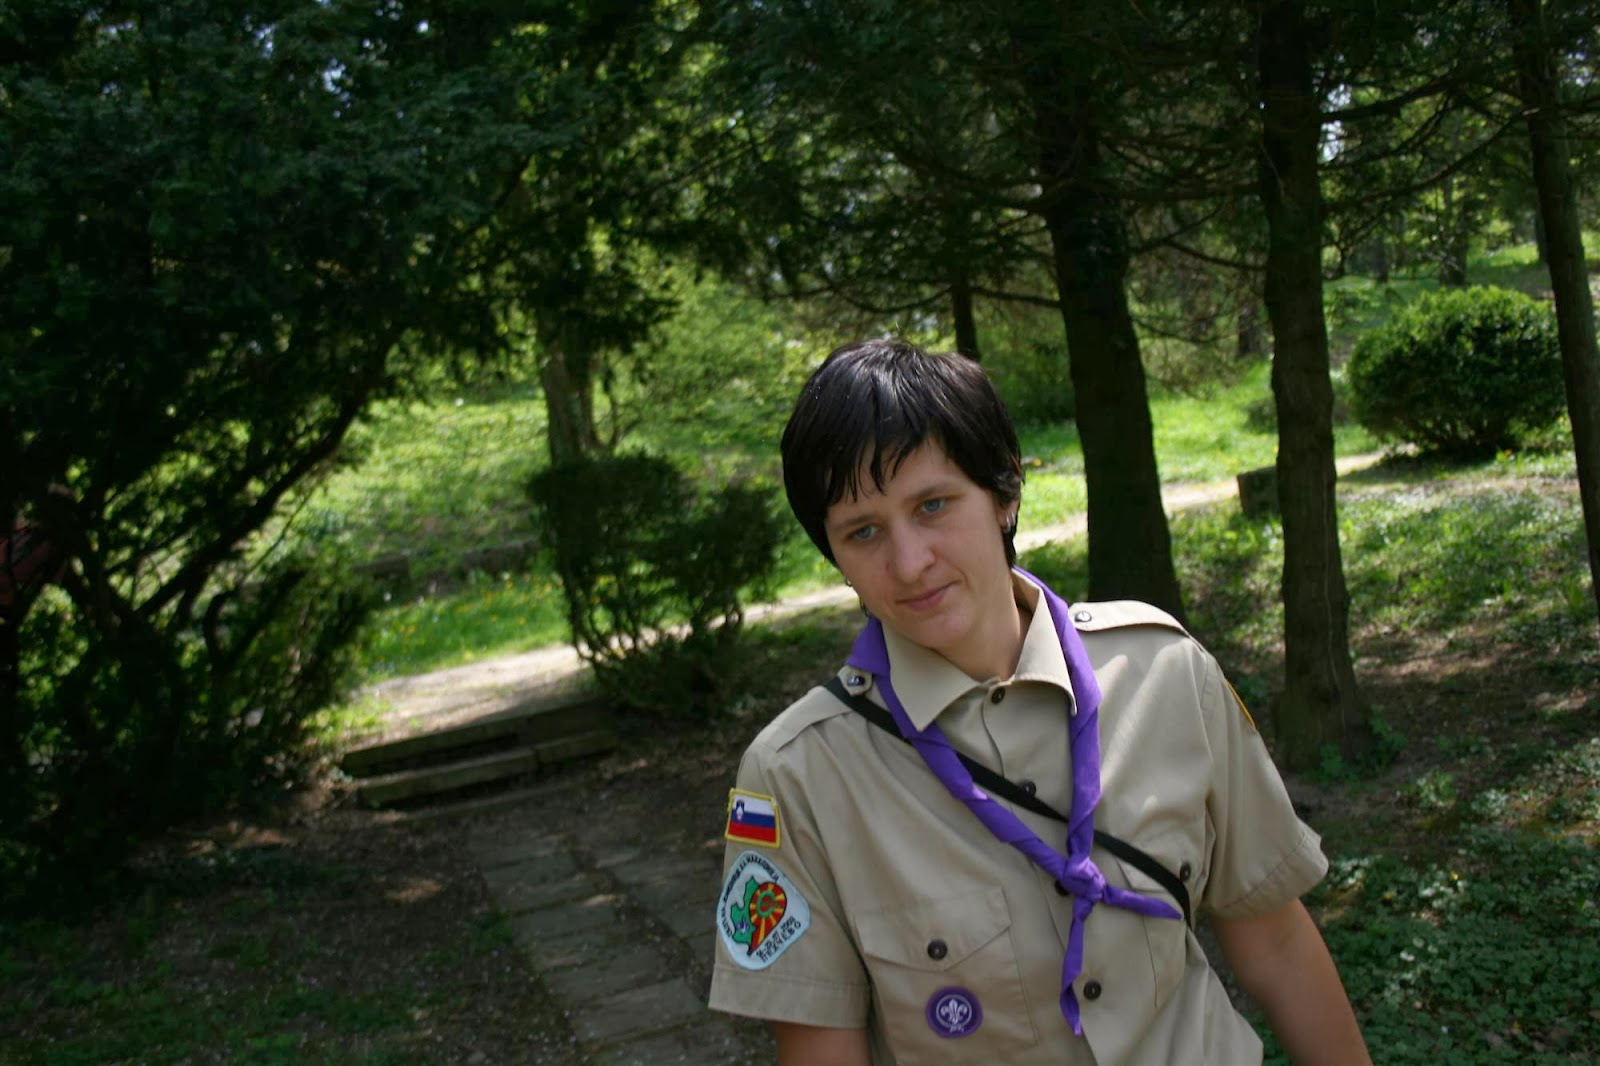 Dan tabornikov, Ilirska Bistrica 2007 - IMG_5786.jpg